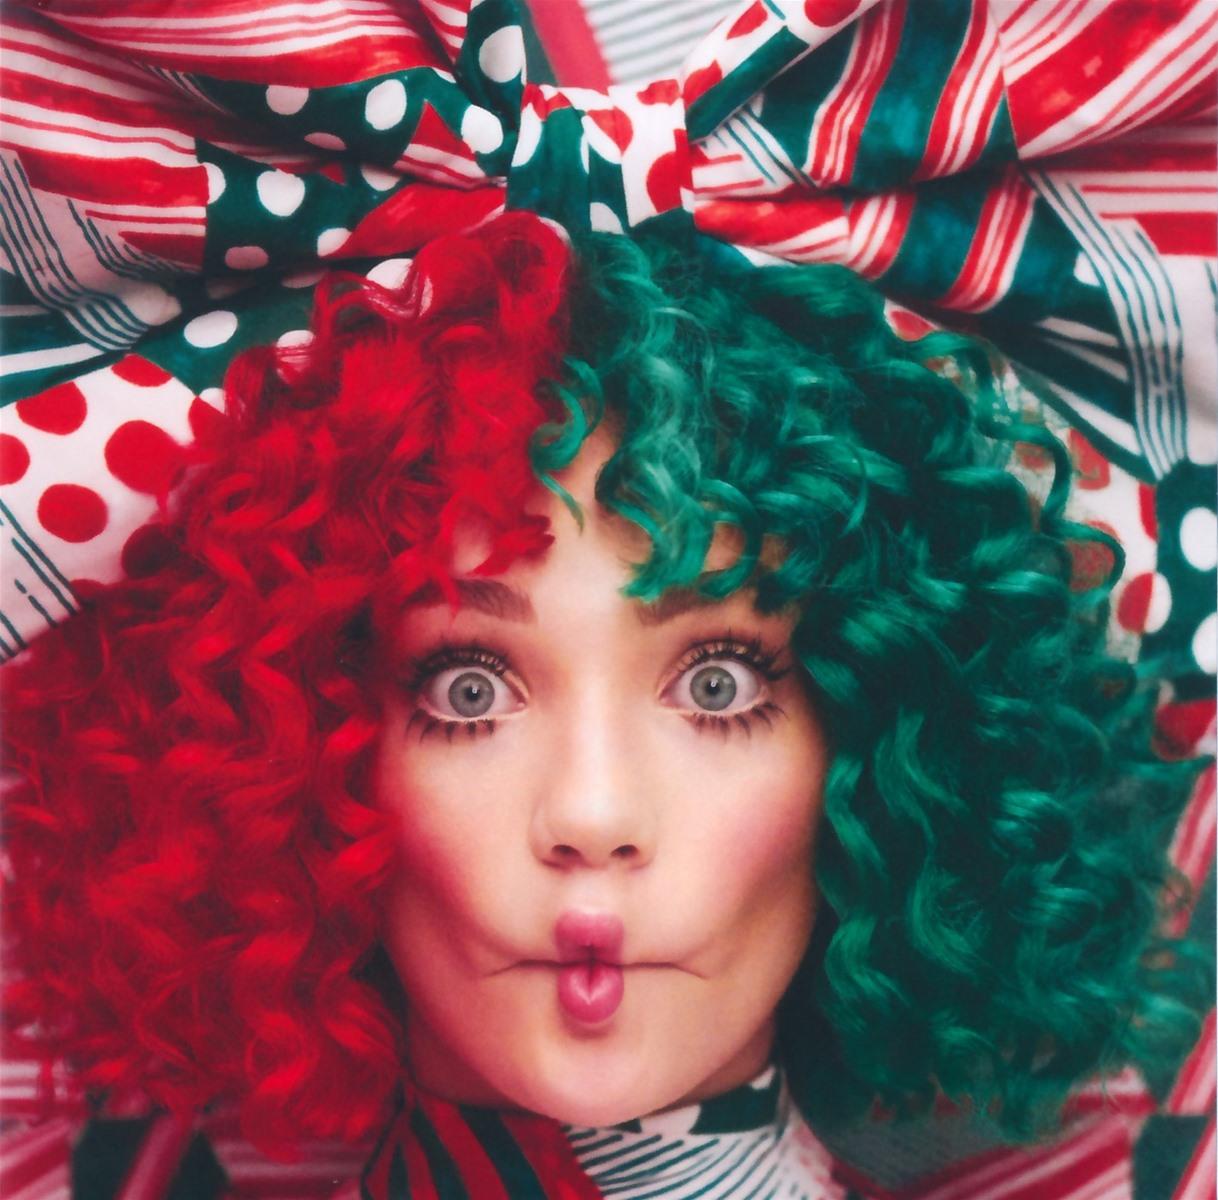 Album_der_Woche_Sia_Everyday is Christmas.jpg